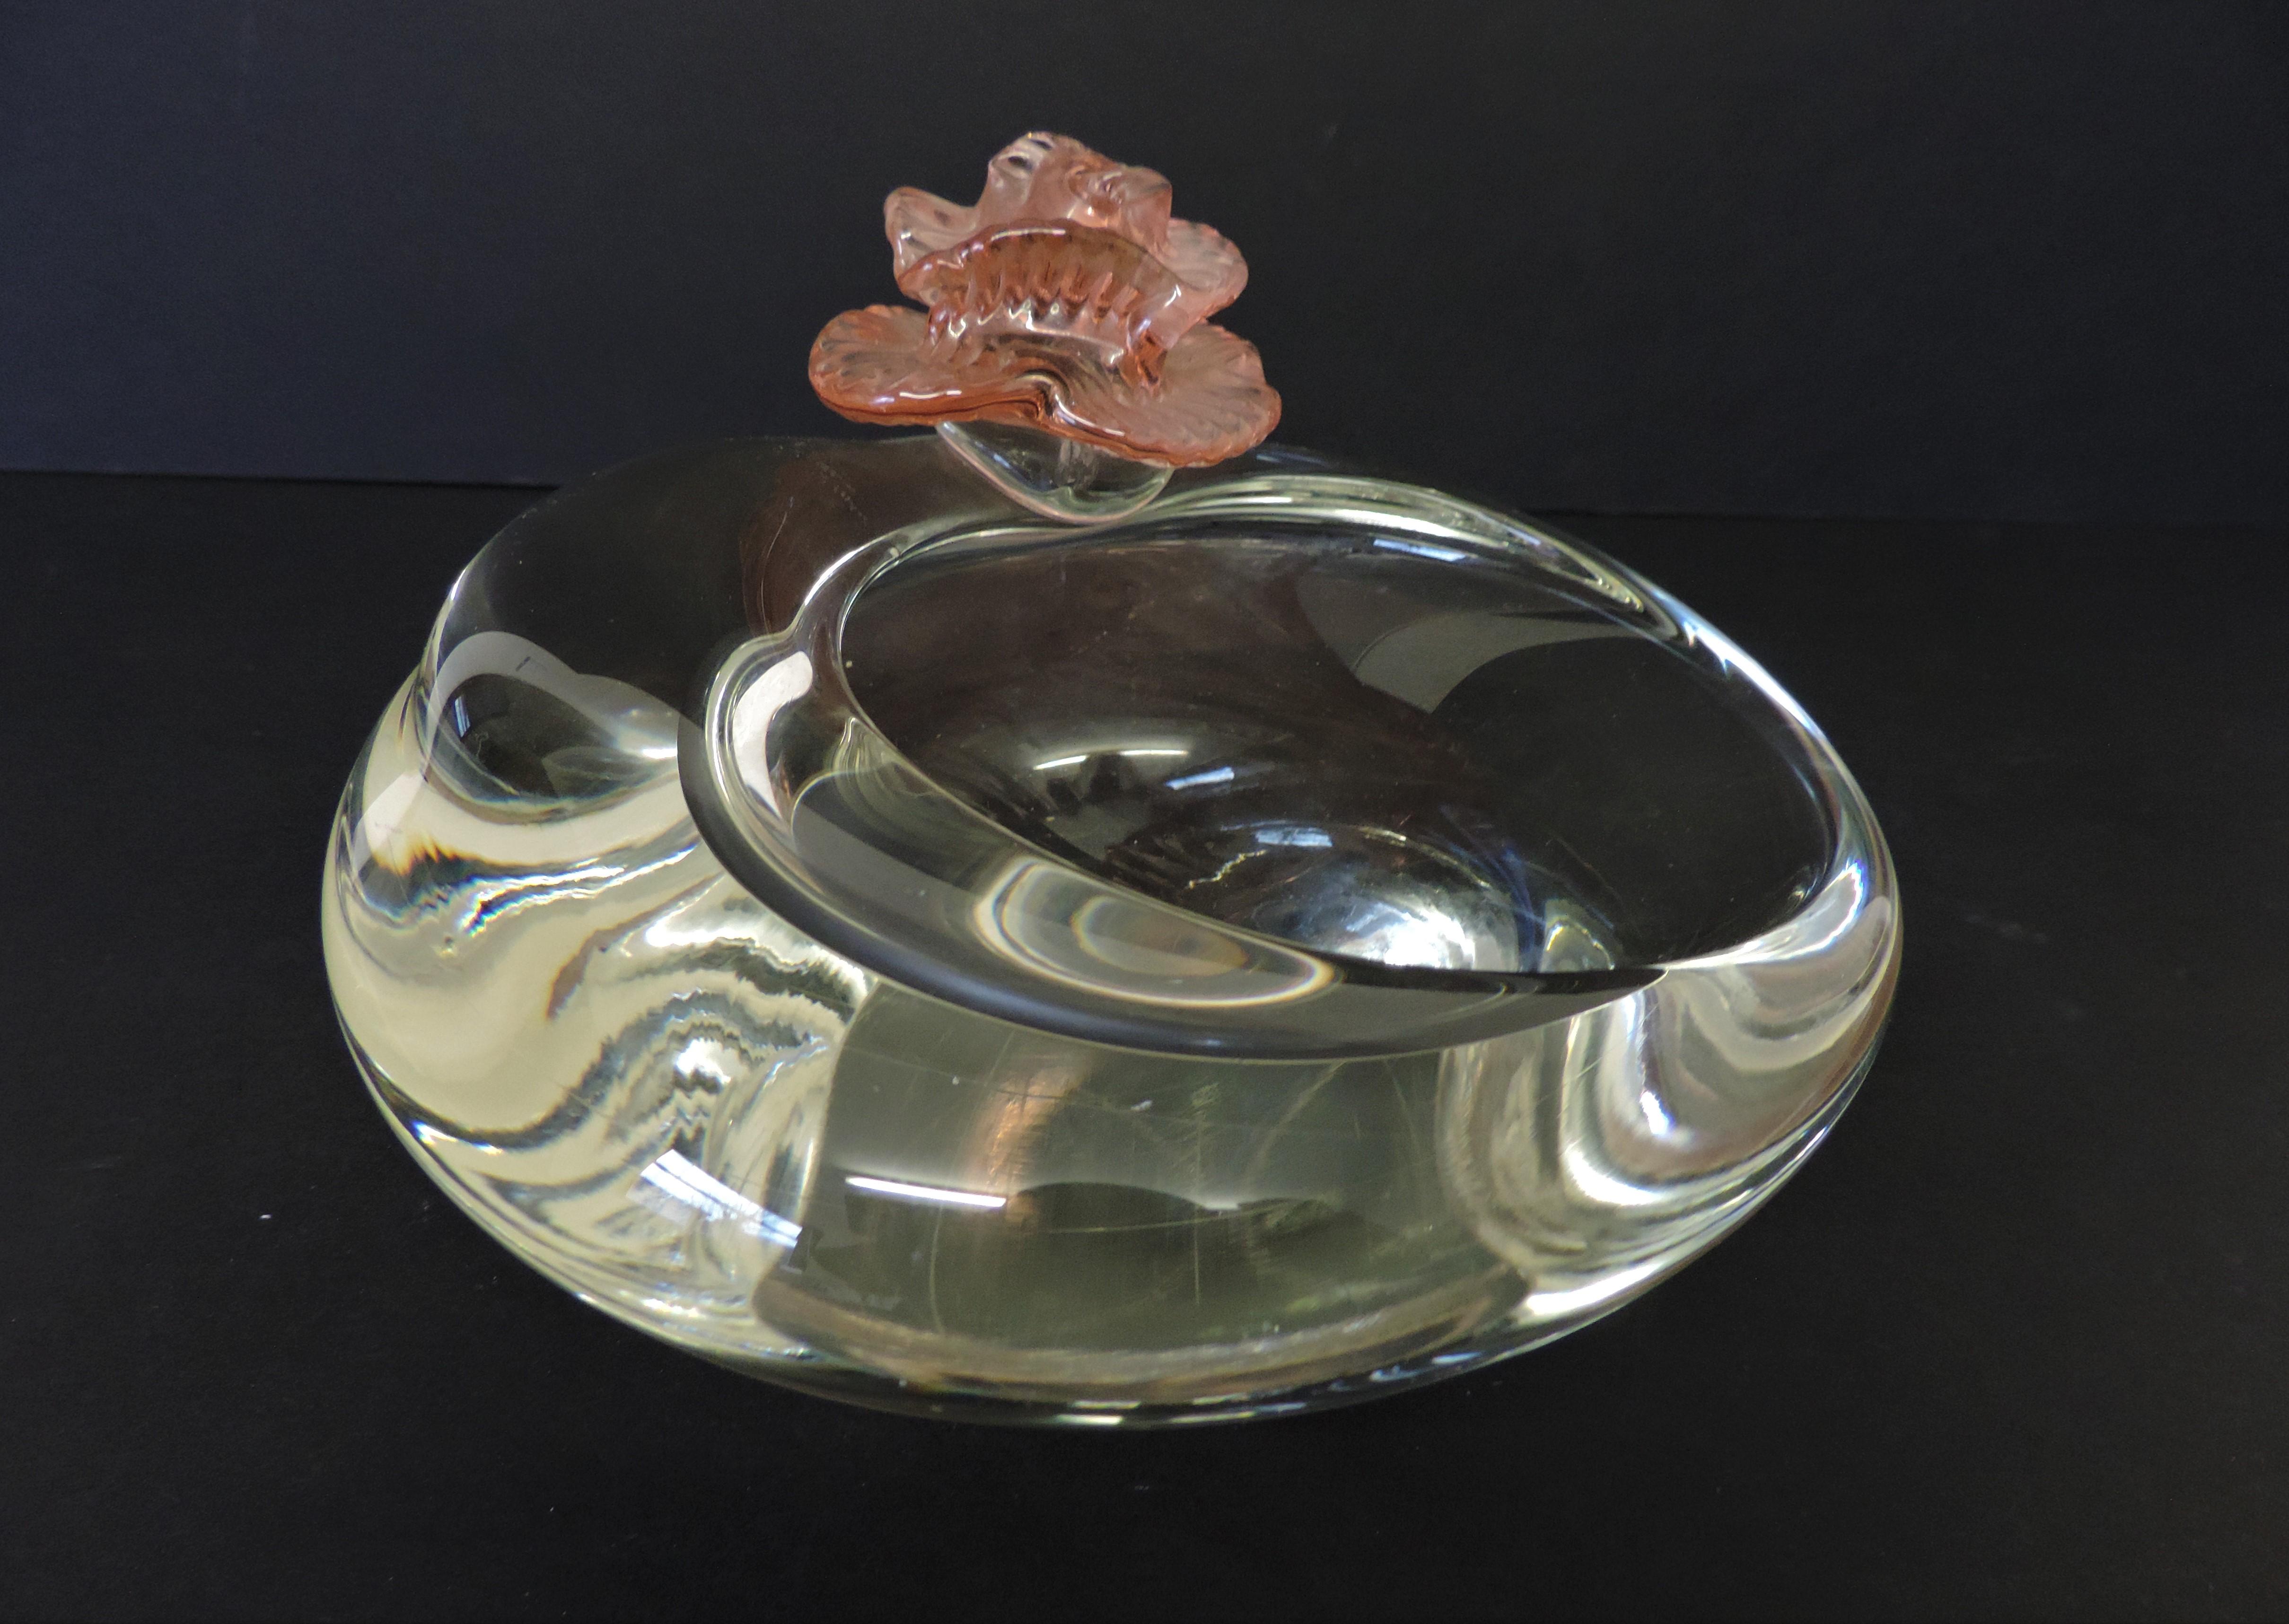 Vintage Murano Glass Bowl - Image 2 of 3